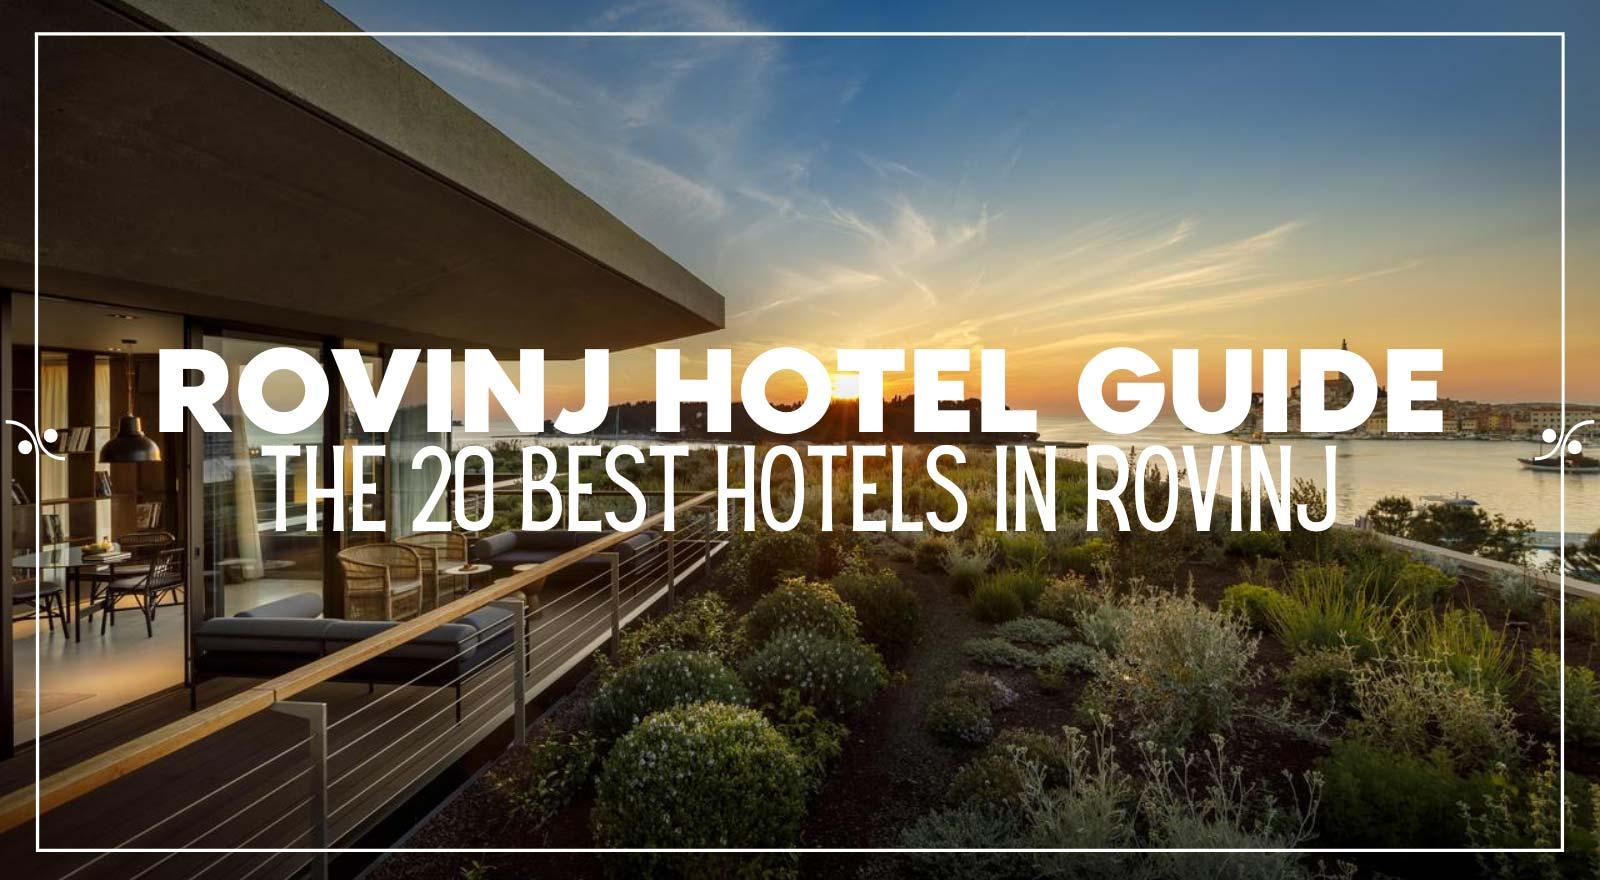 Rovinj Hotel Guide | The Best Hotels In Rovinj, Illustration